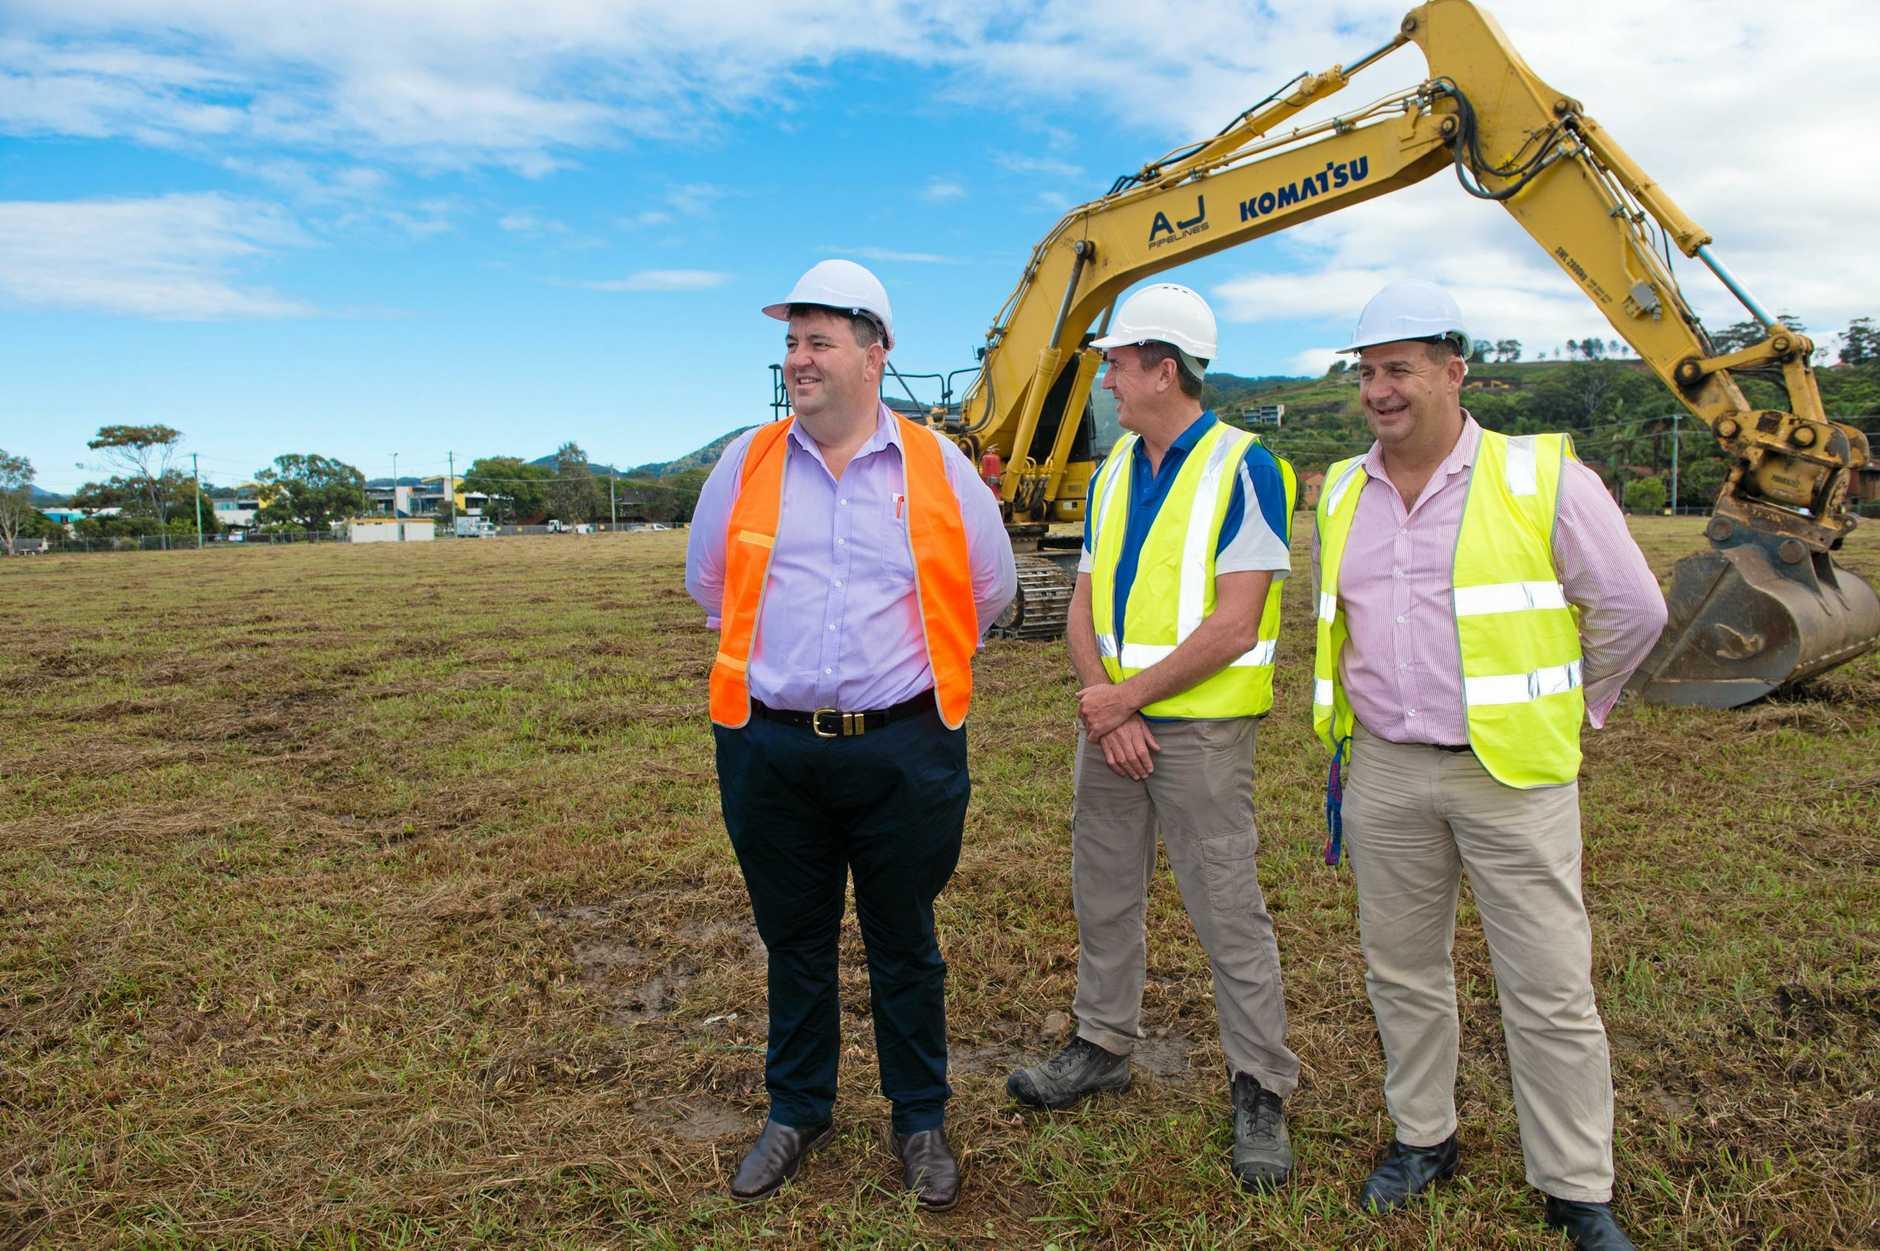 Steve Gooley announces the start of works on the $100 million Shoreline luxury aged care development at Park Beach.